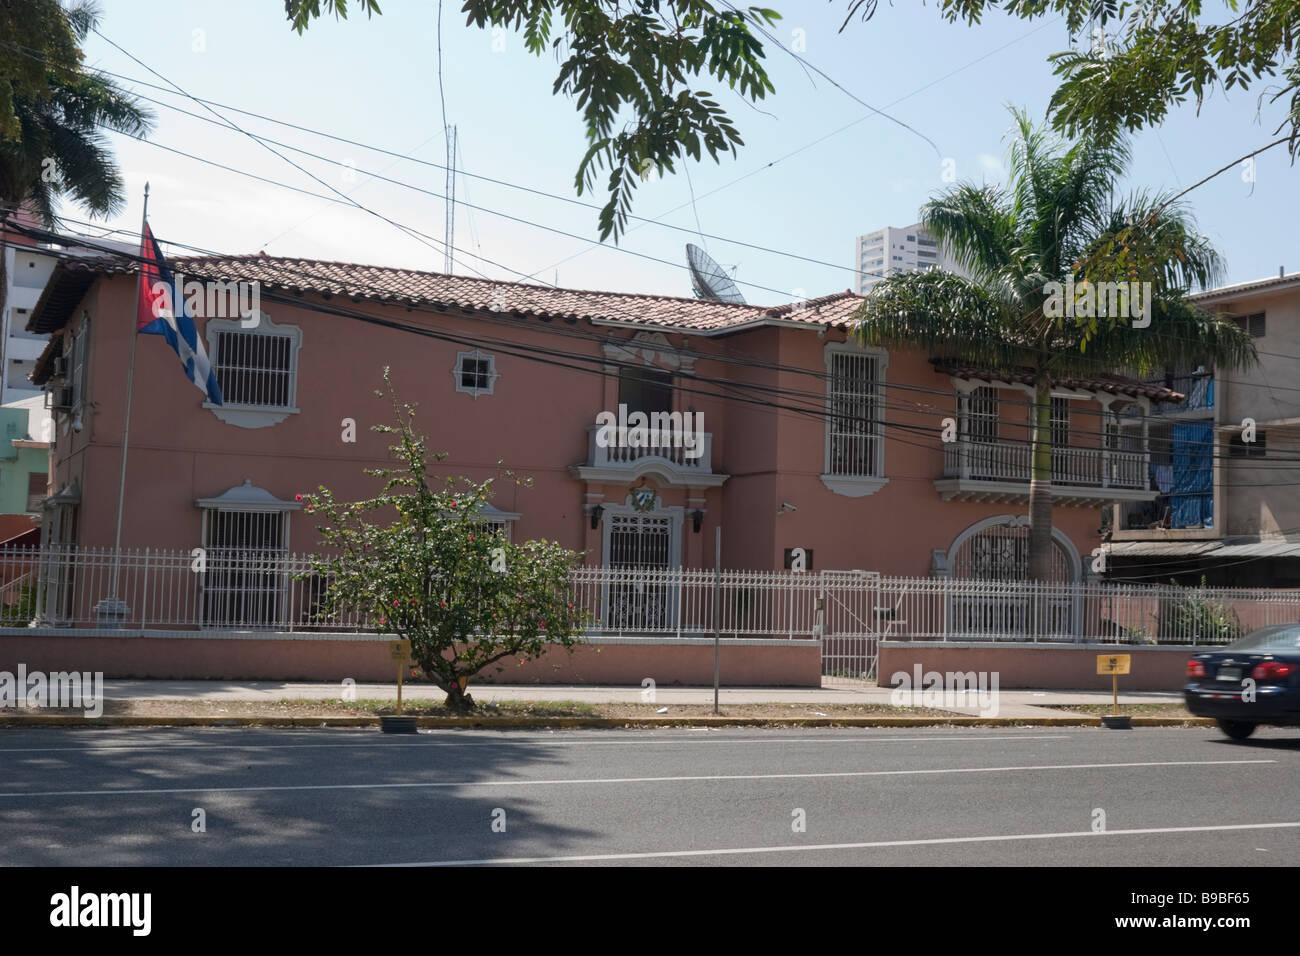 Cuban Embassy. Panama City, Republic of Panama, Central America Stock Photo